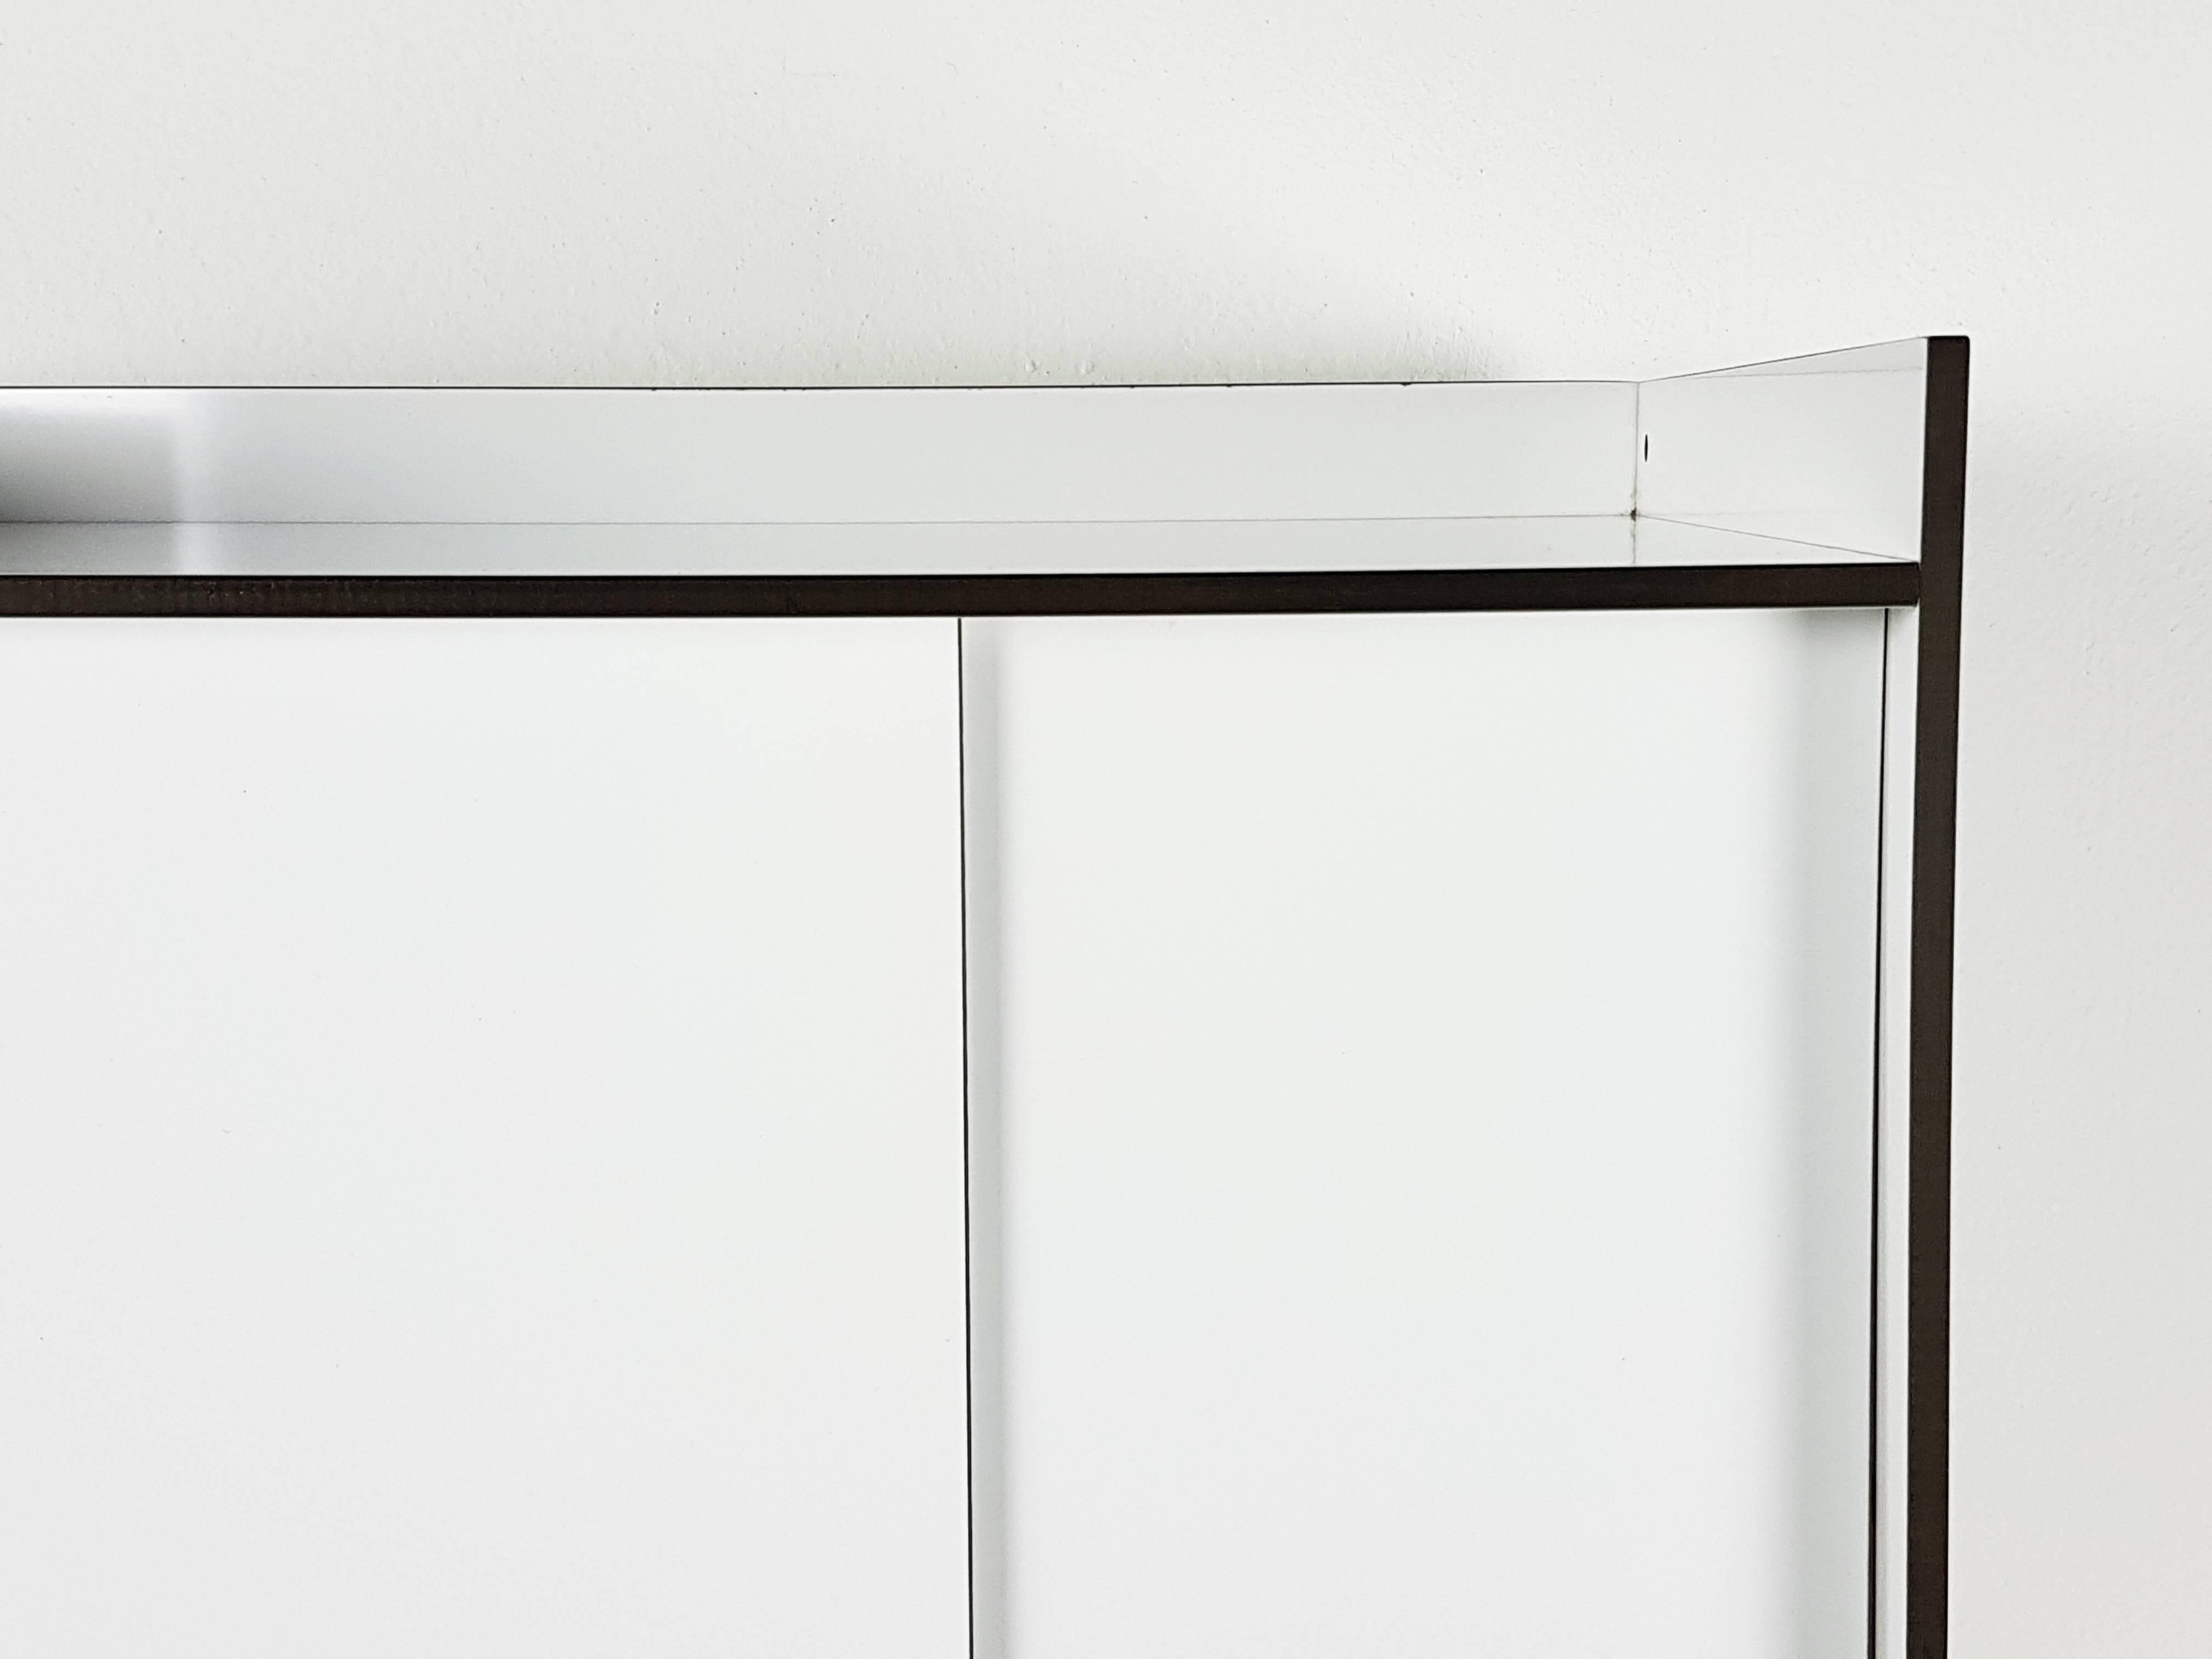 Italian White Laminated Plastic Storage Unit With Shelves And